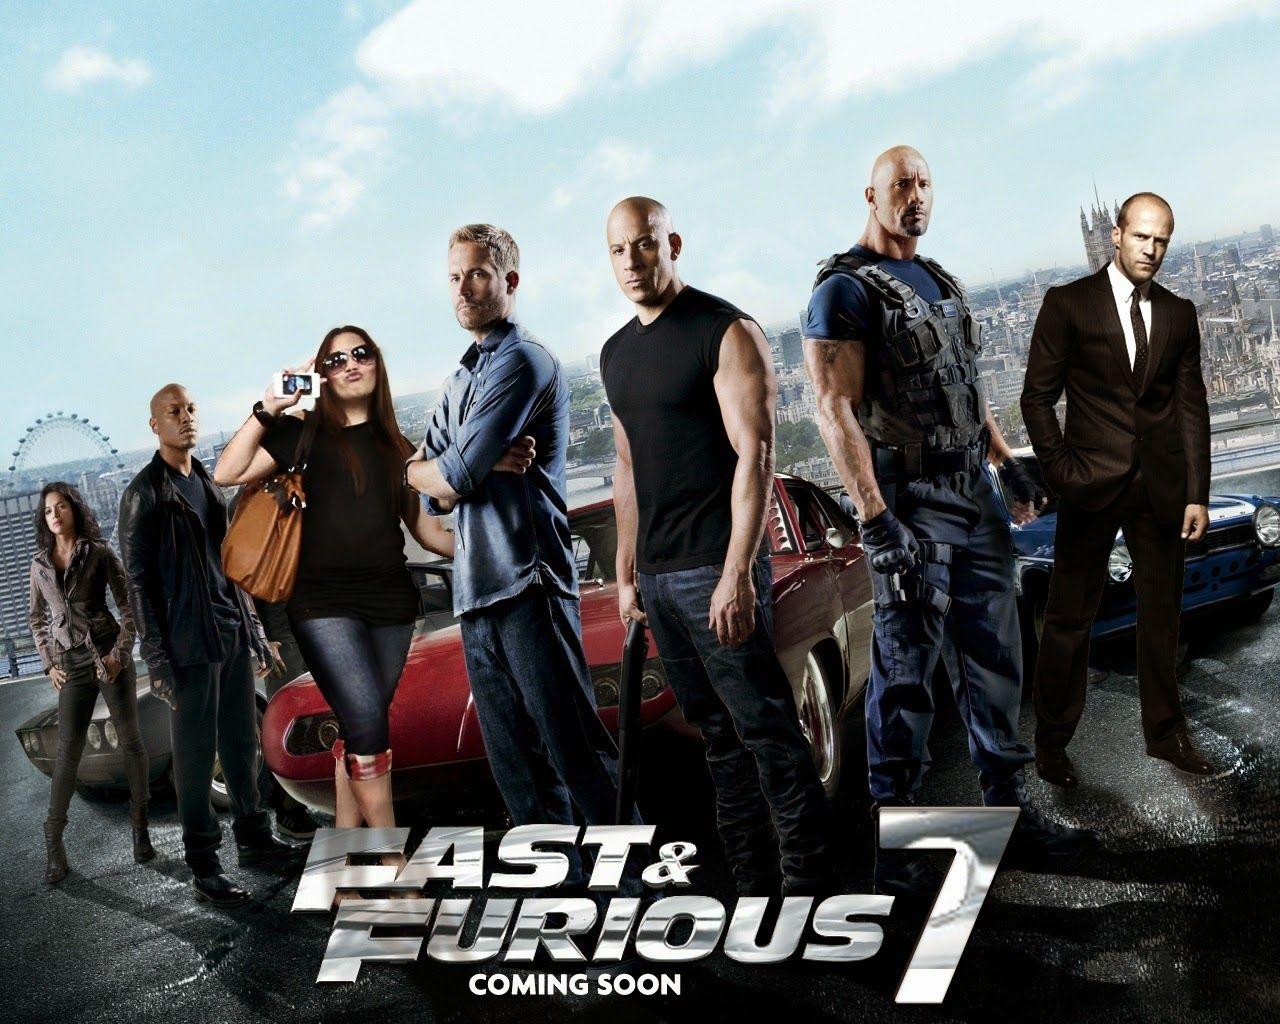 Furious 7 Official Trailer + Trailer Review : Beyond The ...Fast And Furious 7 Trailer Official 2013 Full Movie